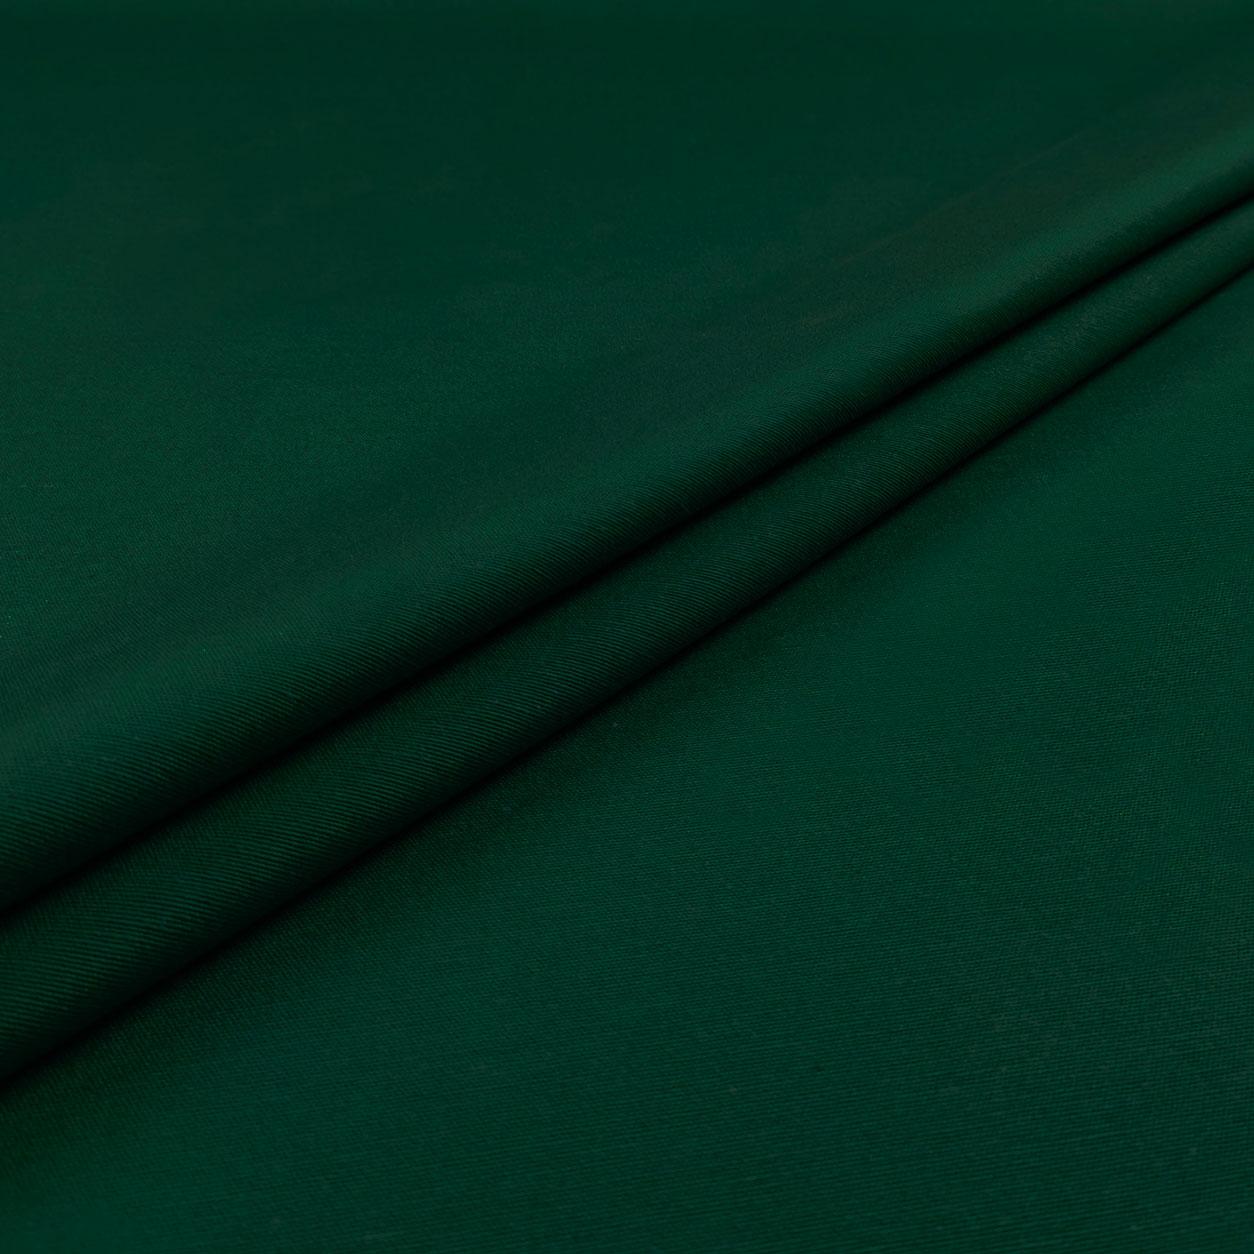 Tessuto Misto Cotone Tinta Unita Verde